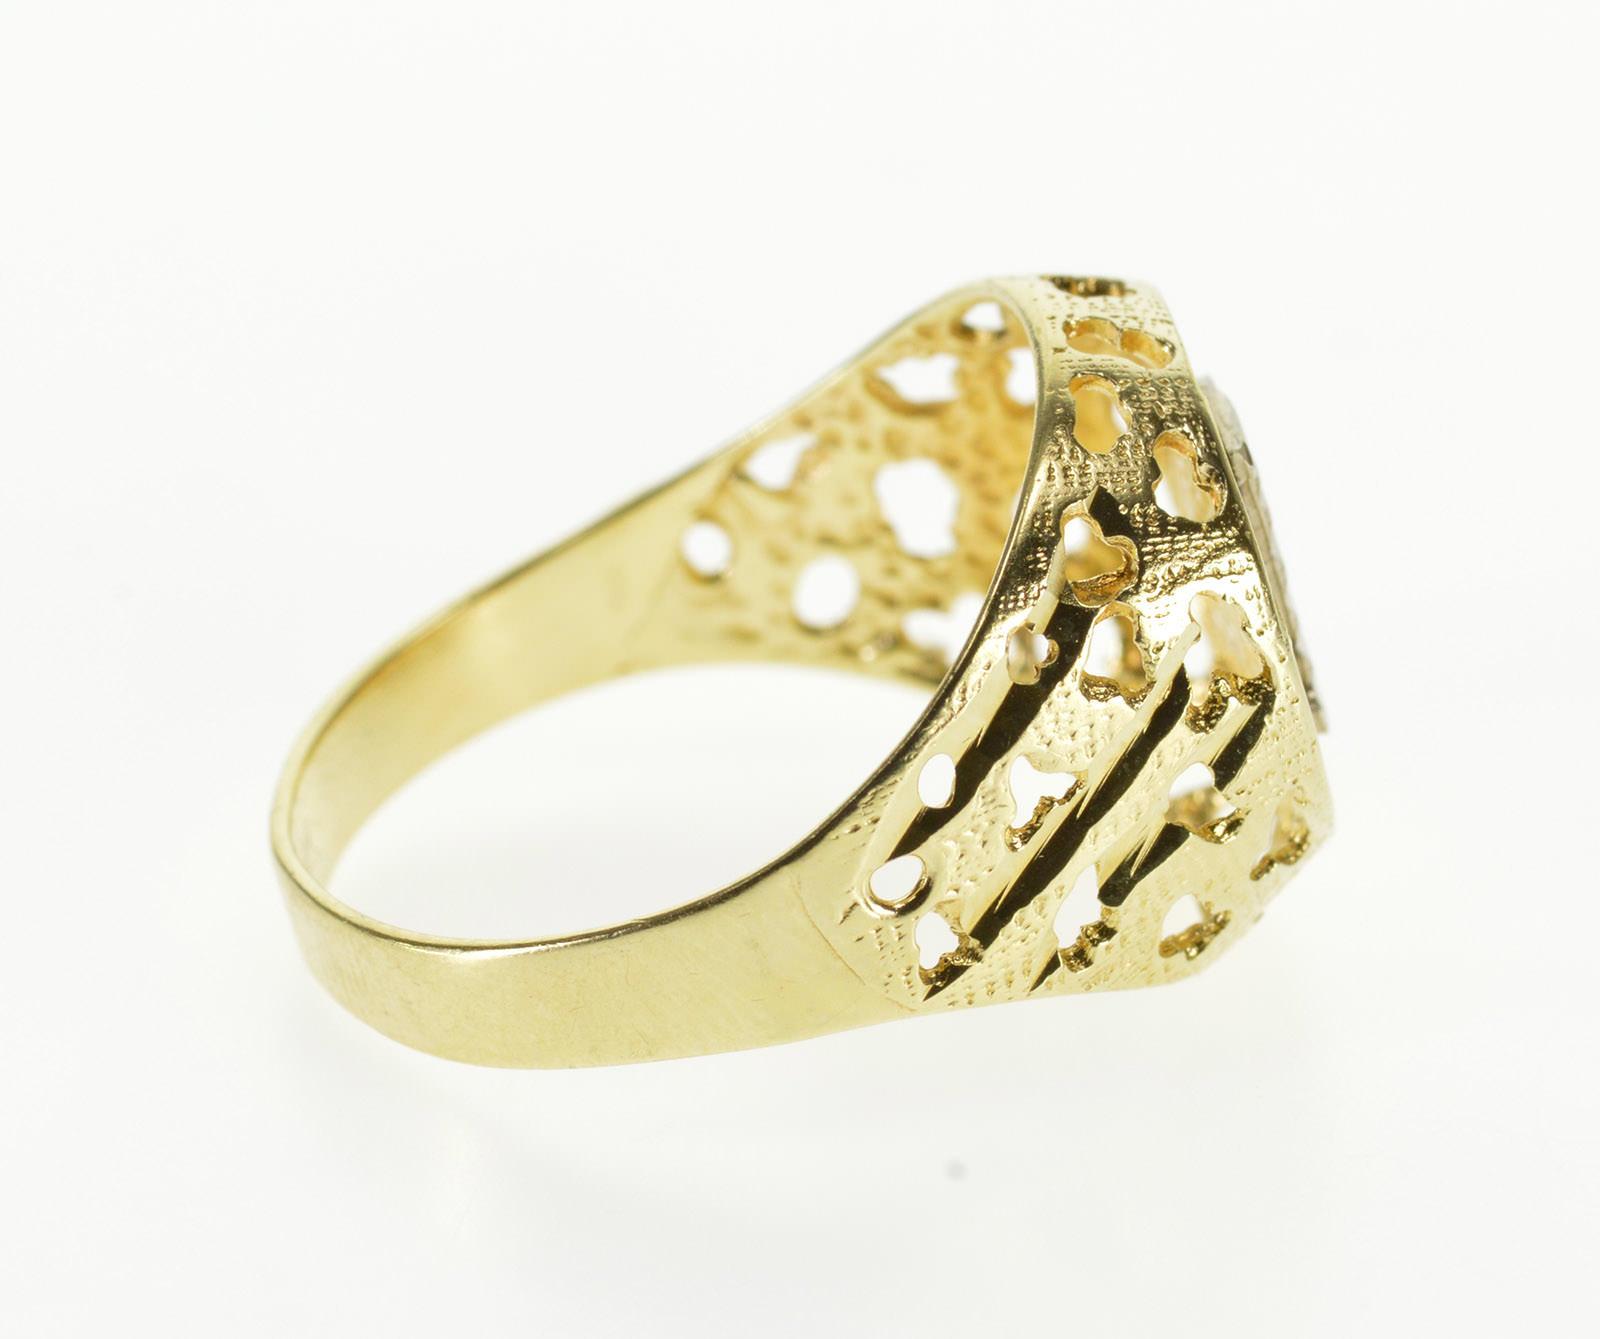 New 14ct Yellow Gold Fancy Cubic Zirconia Lattice Ring Size P